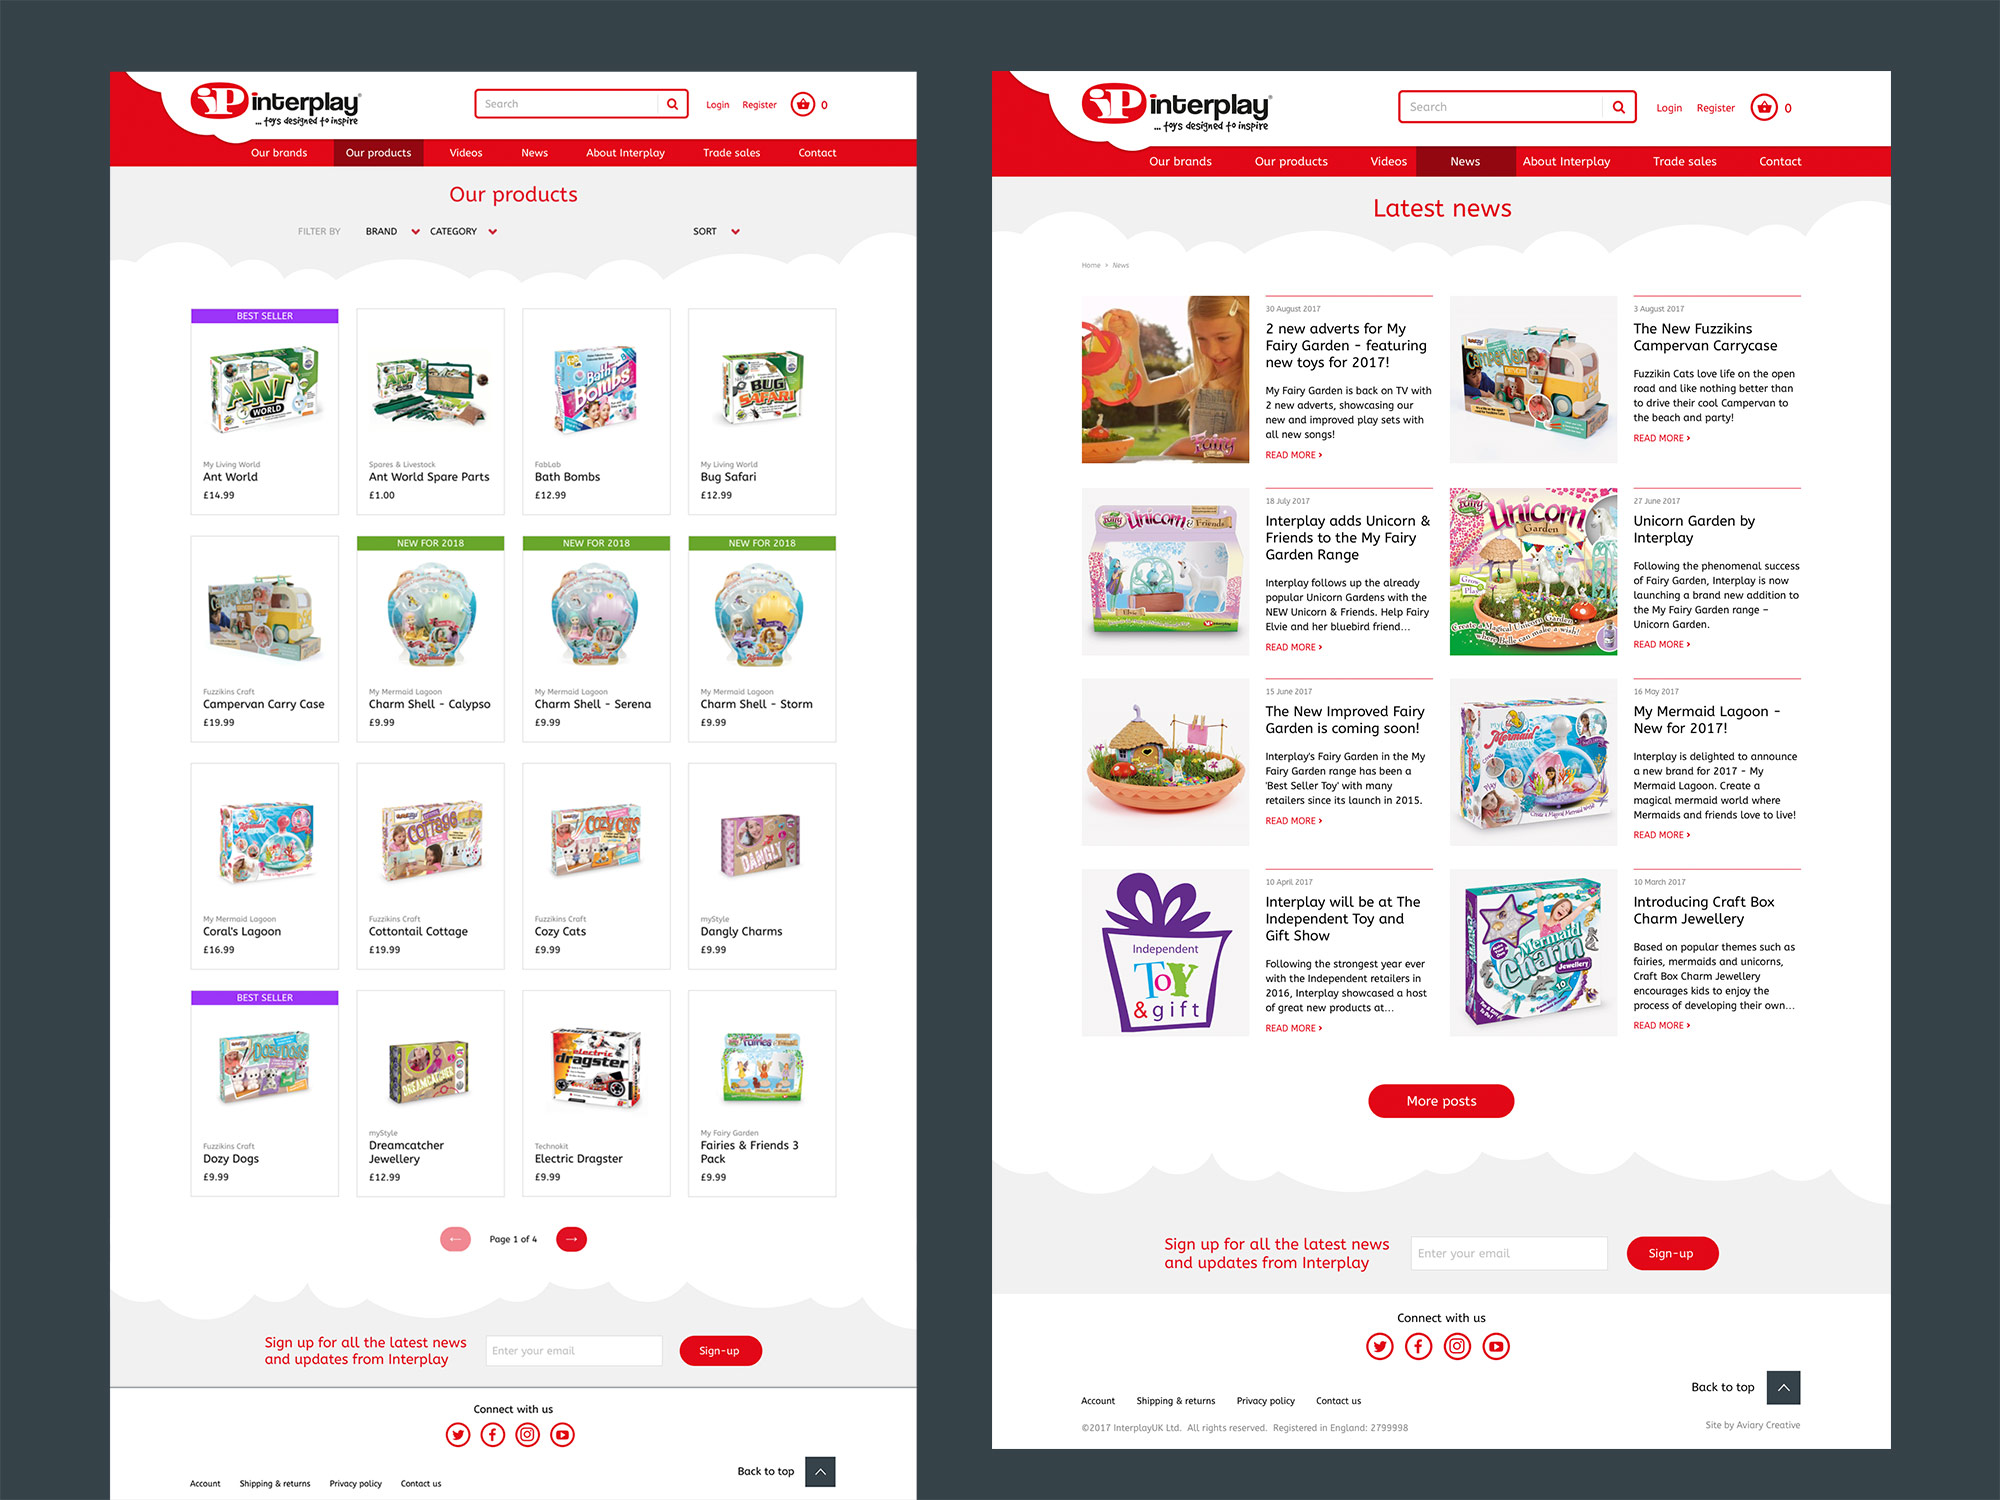 Interplay website